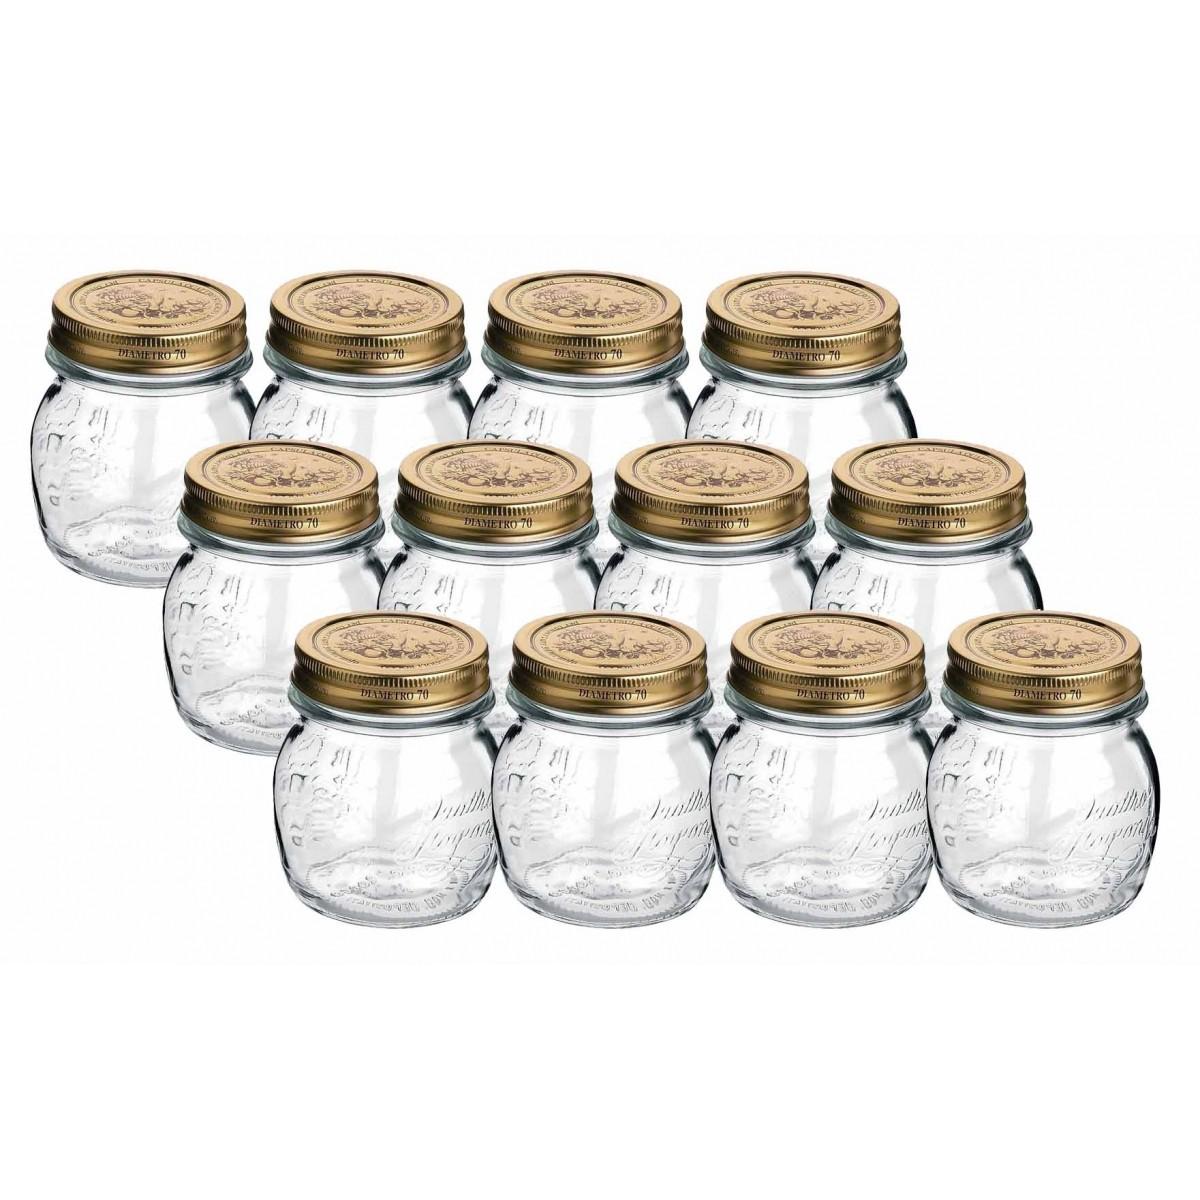 Conj 12 Potes de Vidro Quattro Stagioni 250 ml Para Conservas e Afins COM Tampa Original